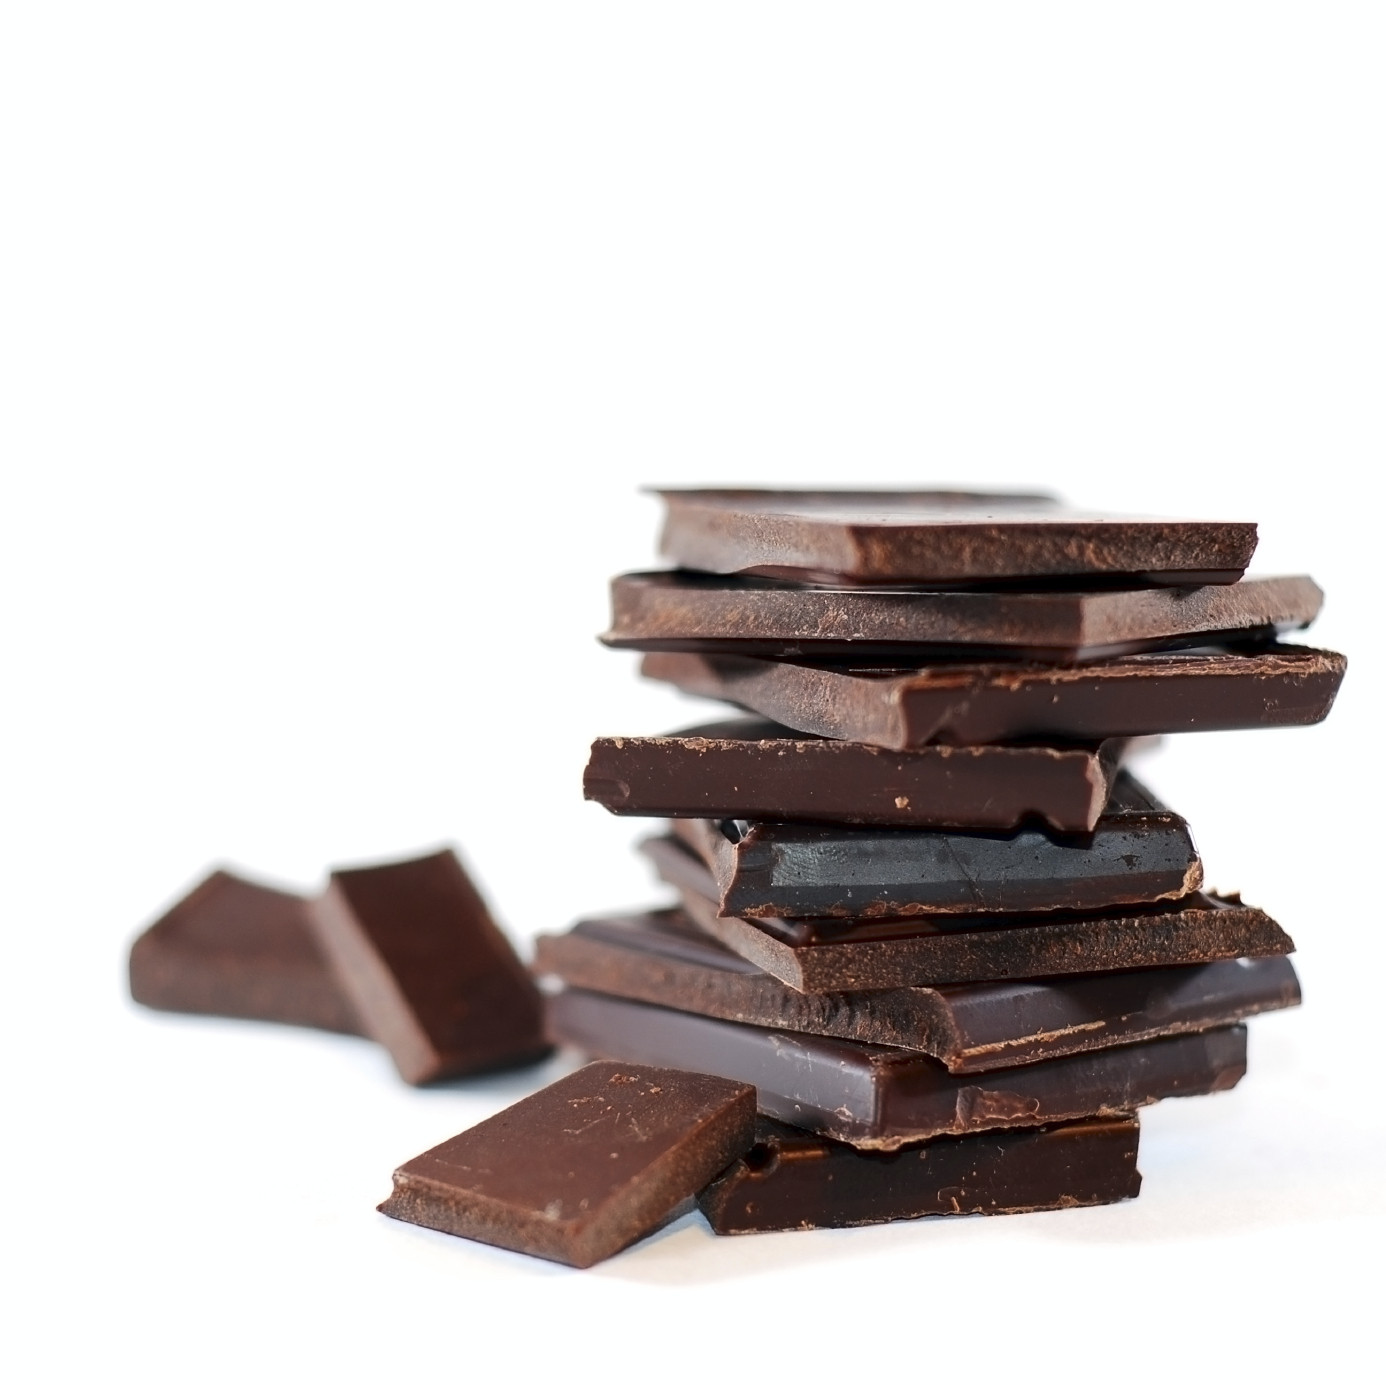 chocolate-stack_iStock000004853053